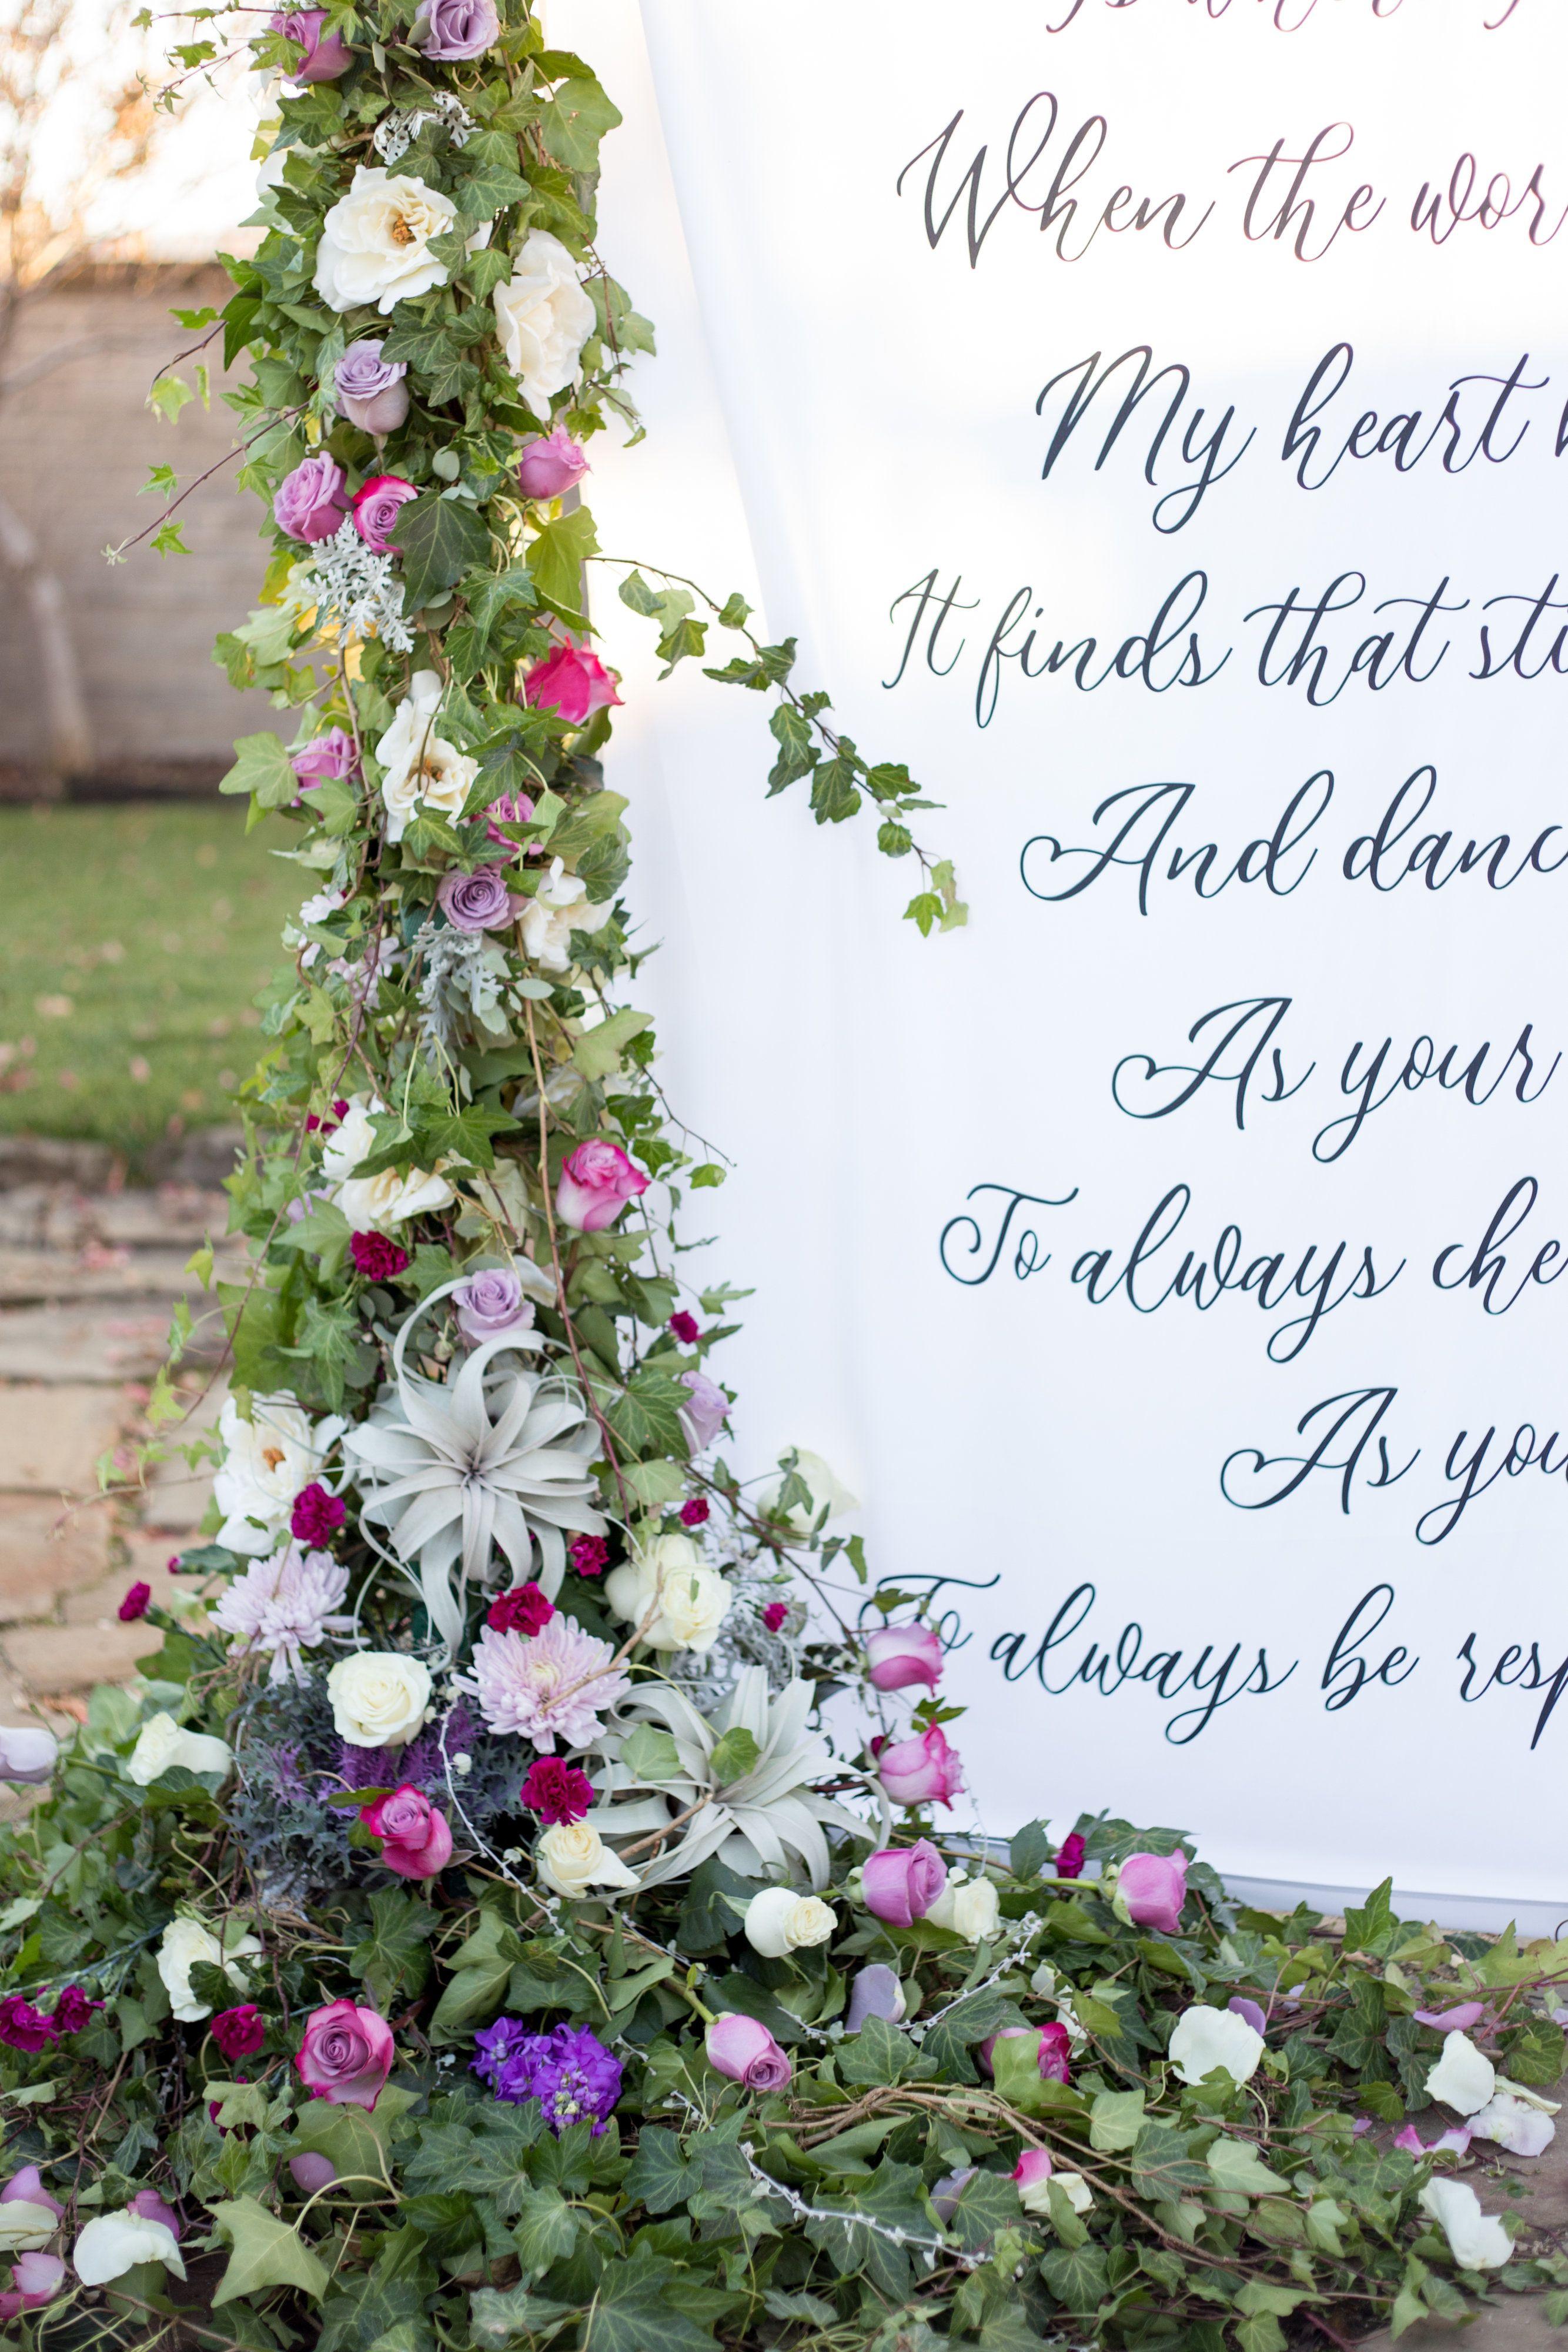 Outdoor wedding ceremony backdrop ideas #dreamwedding # ...